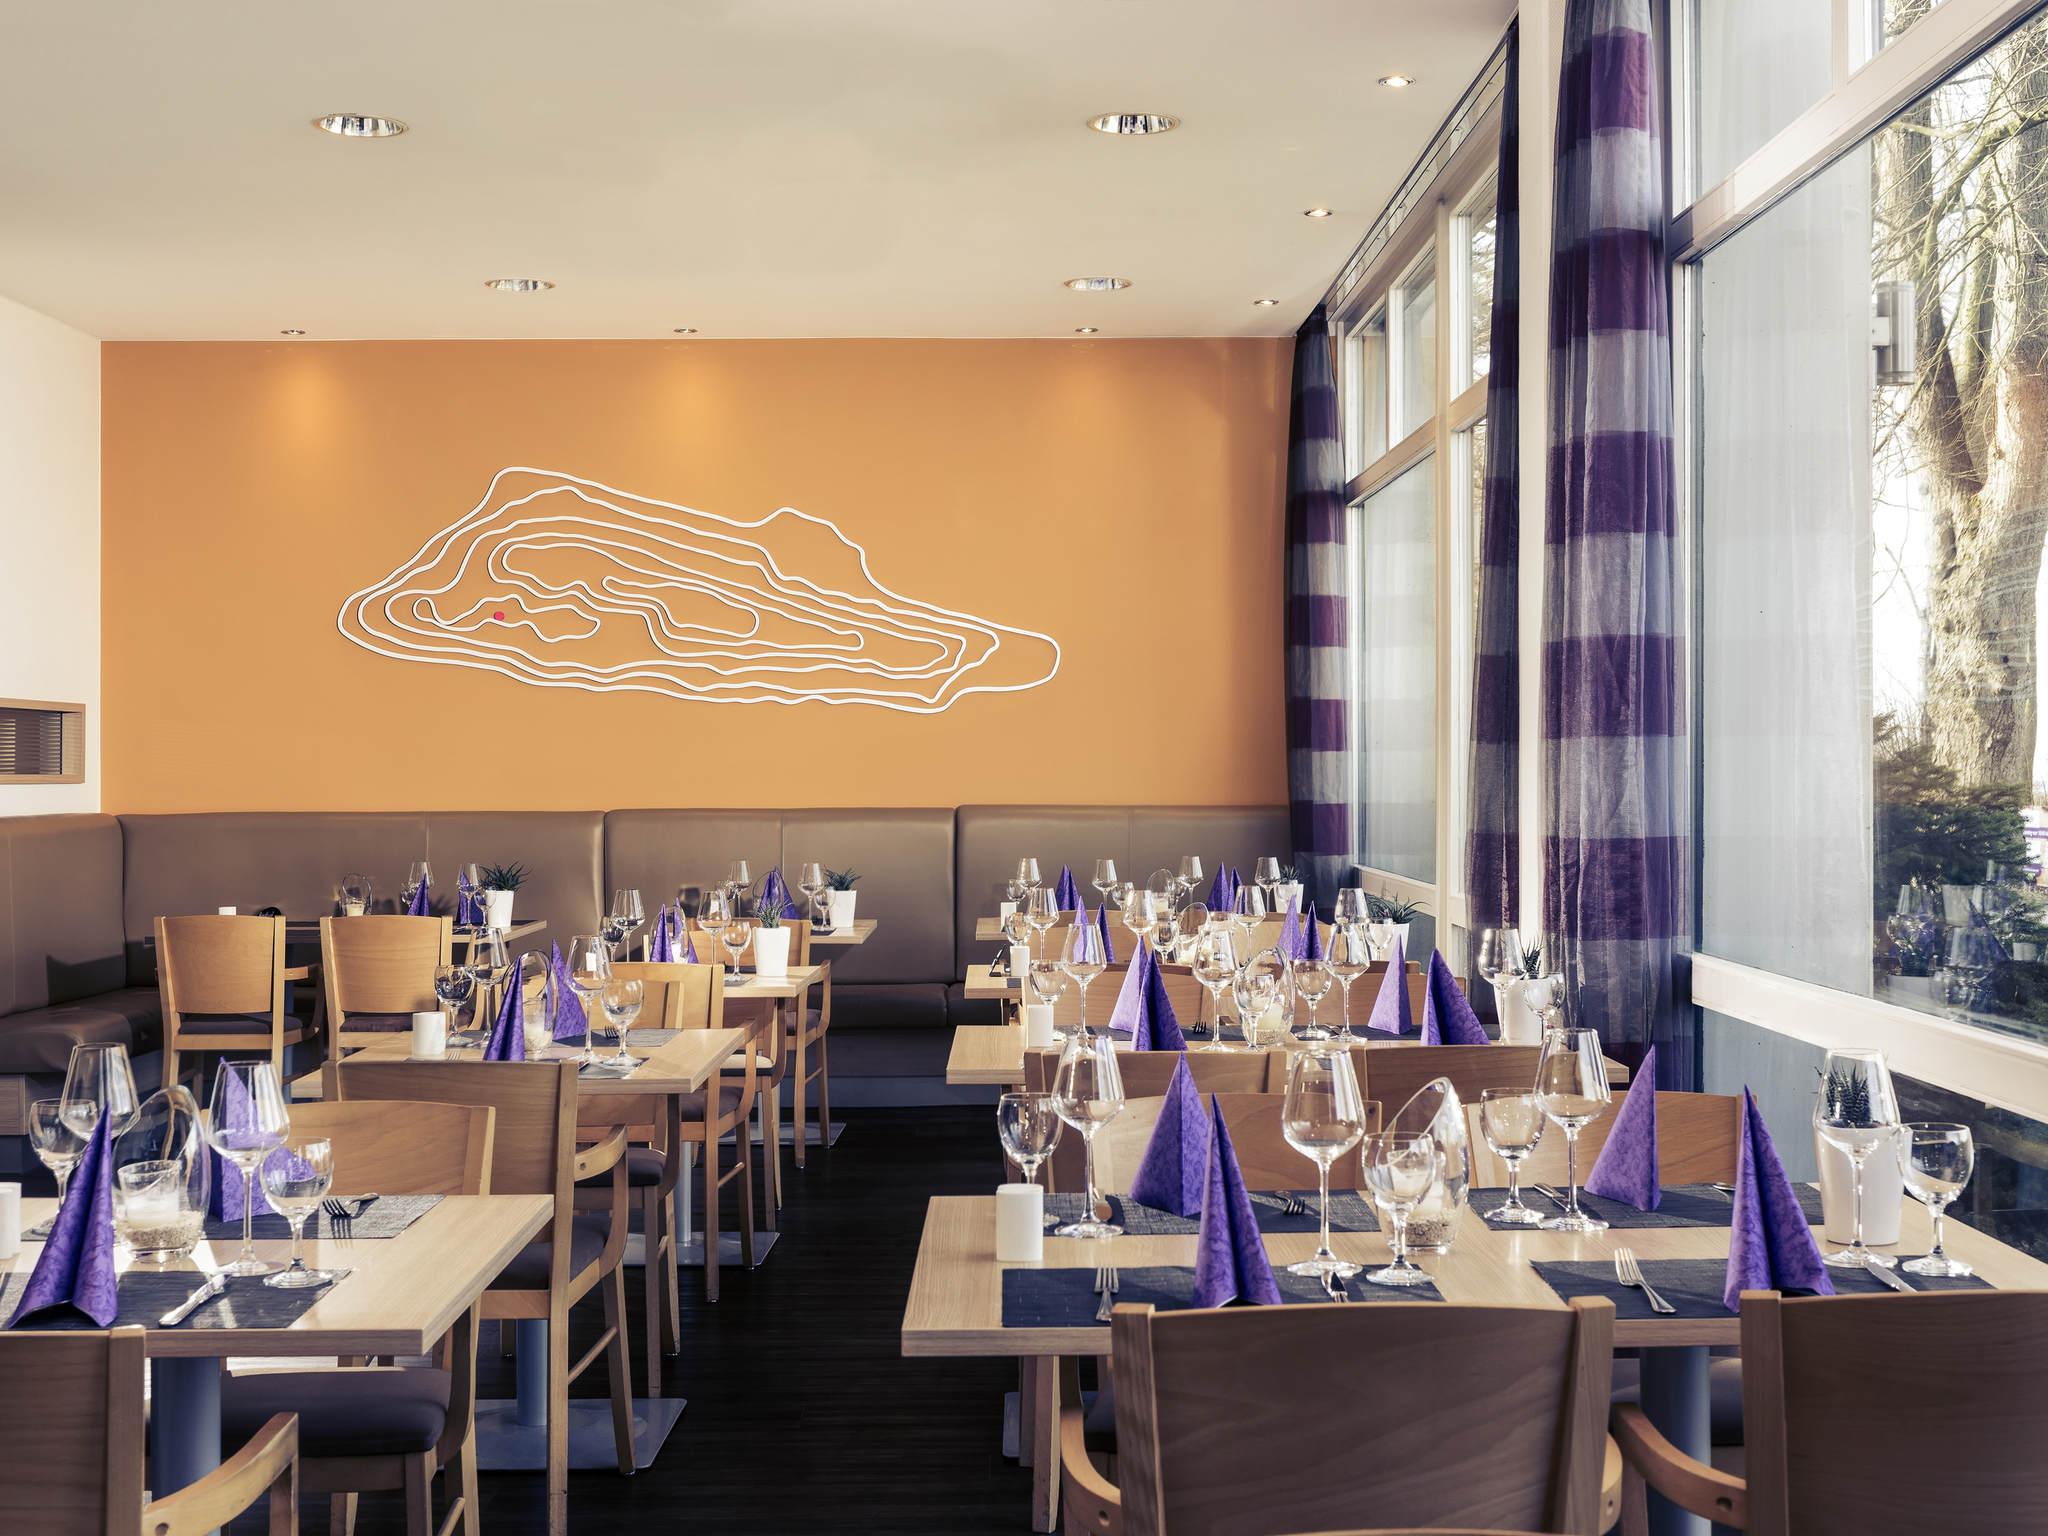 Mercure Hotel Bielefeld Restaurant